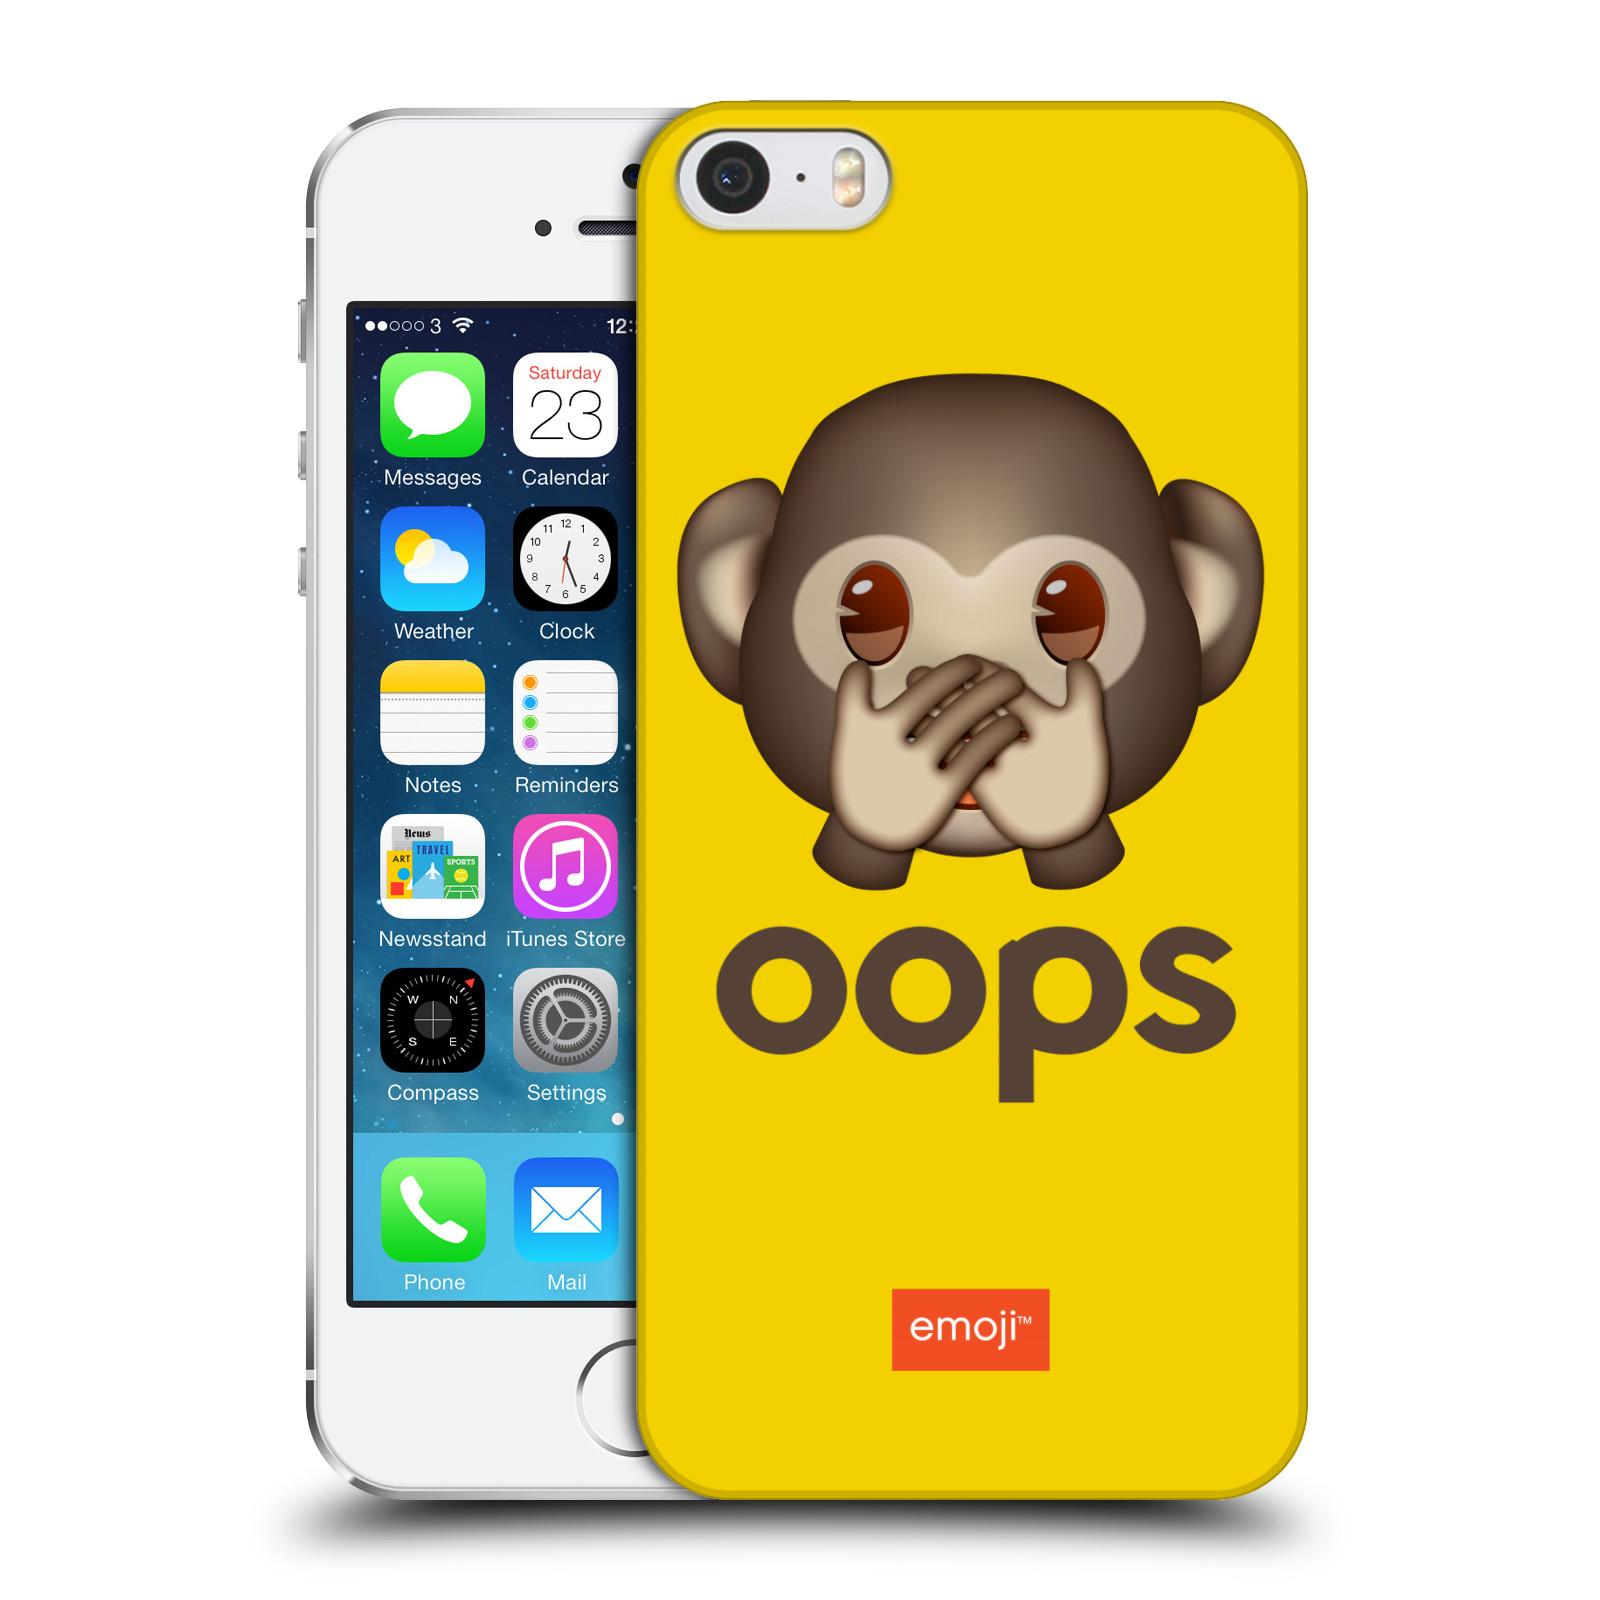 Plastové pouzdro na mobil Apple iPhone 5 a 5S HEAD CASE EMOJI - Opička OOPS